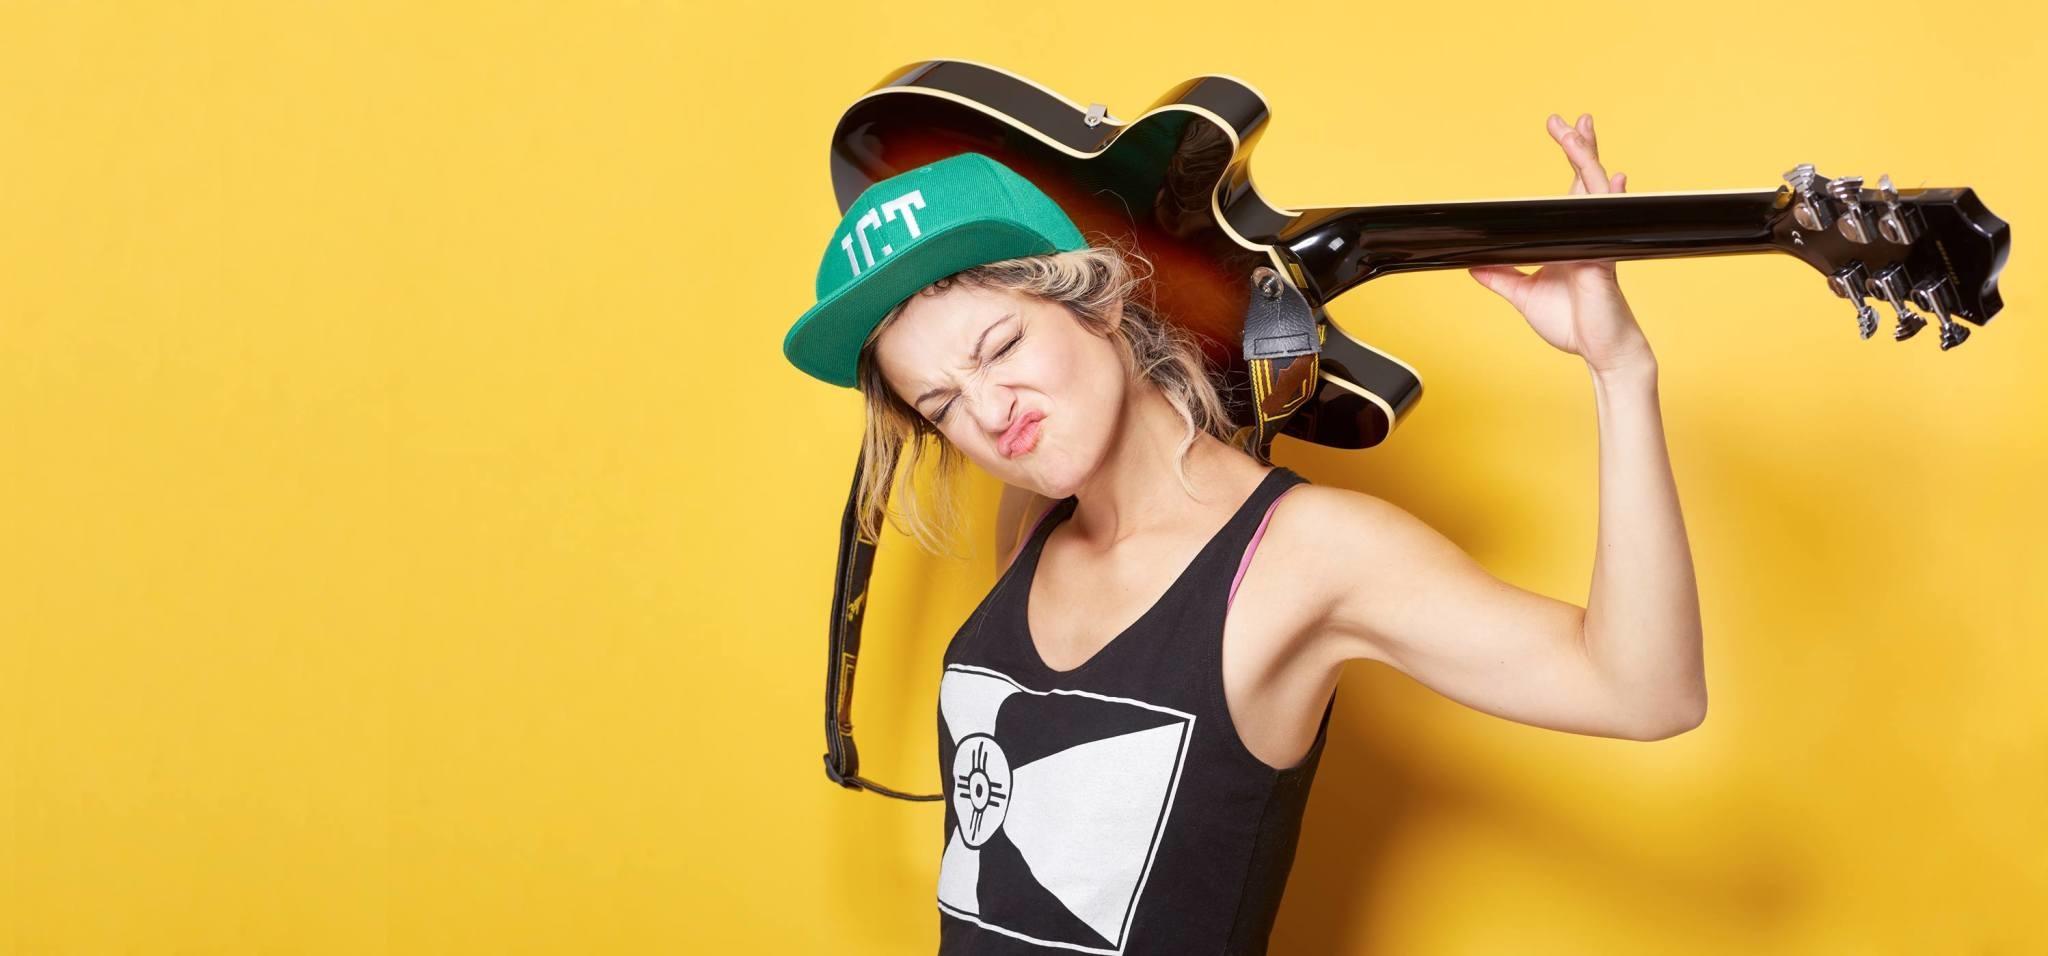 Aidee Gandarilla Jenny Wood *PRESALE* ICT Hat